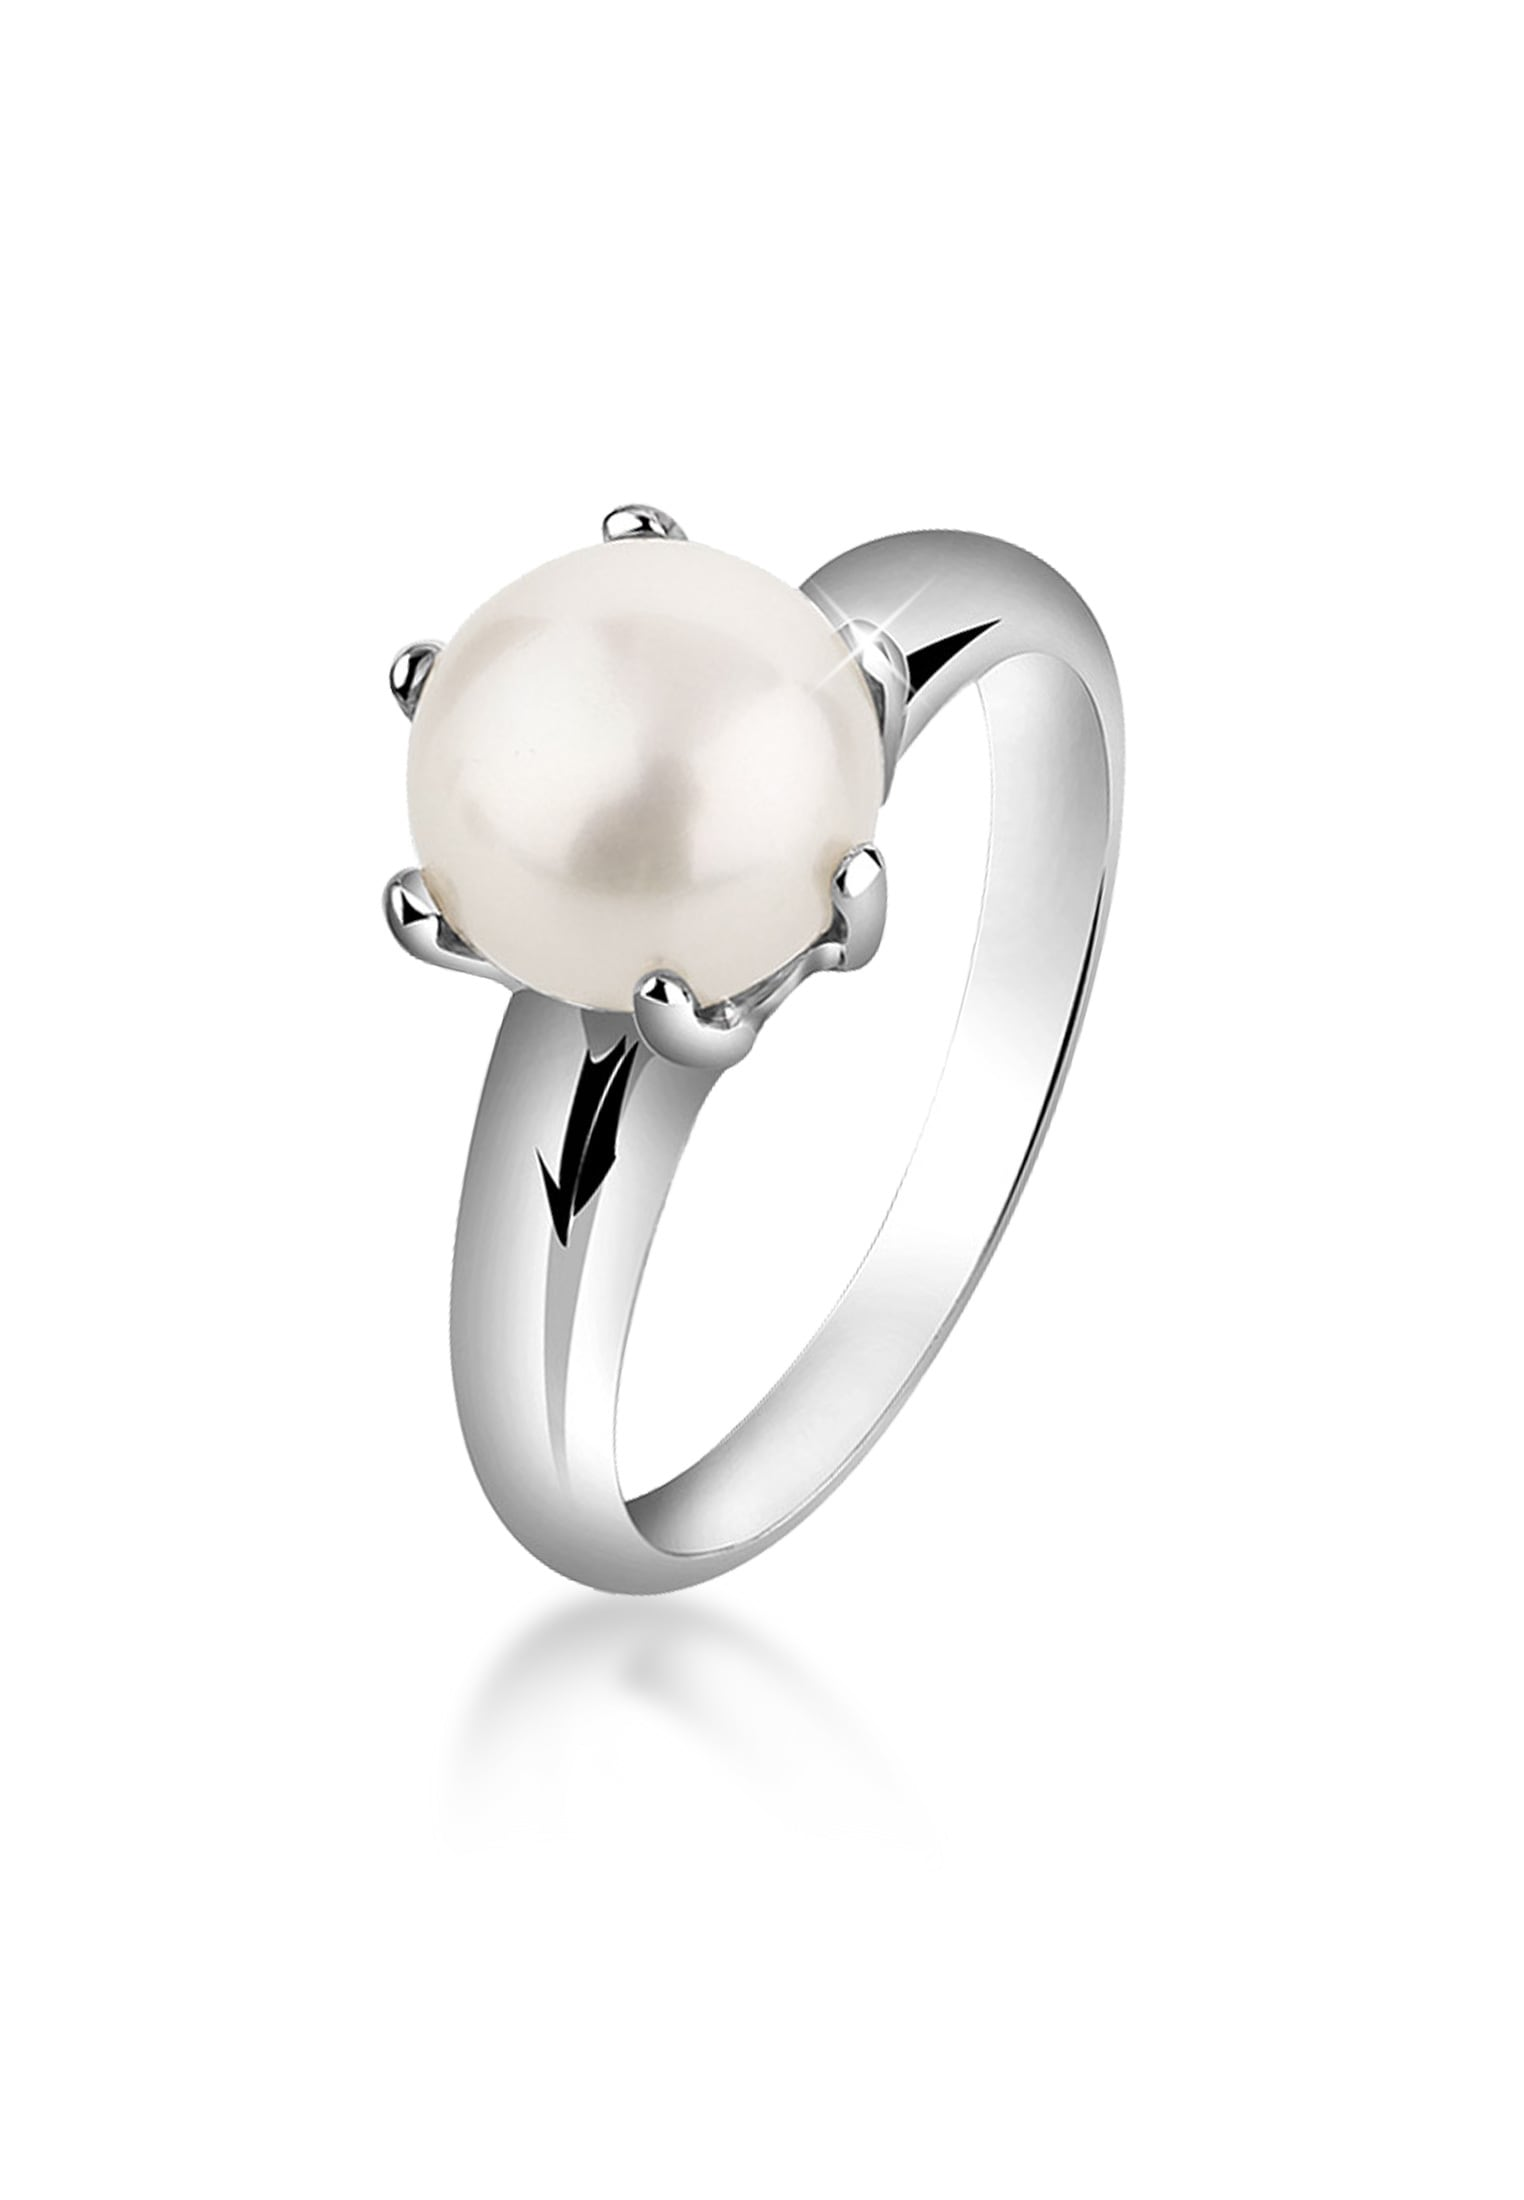 Nenalina Perlenring Perlenring Süßwasserzuchtperle Klassik 925 Silber | Schmuck > Ringe > Perlenringe | Nenalina